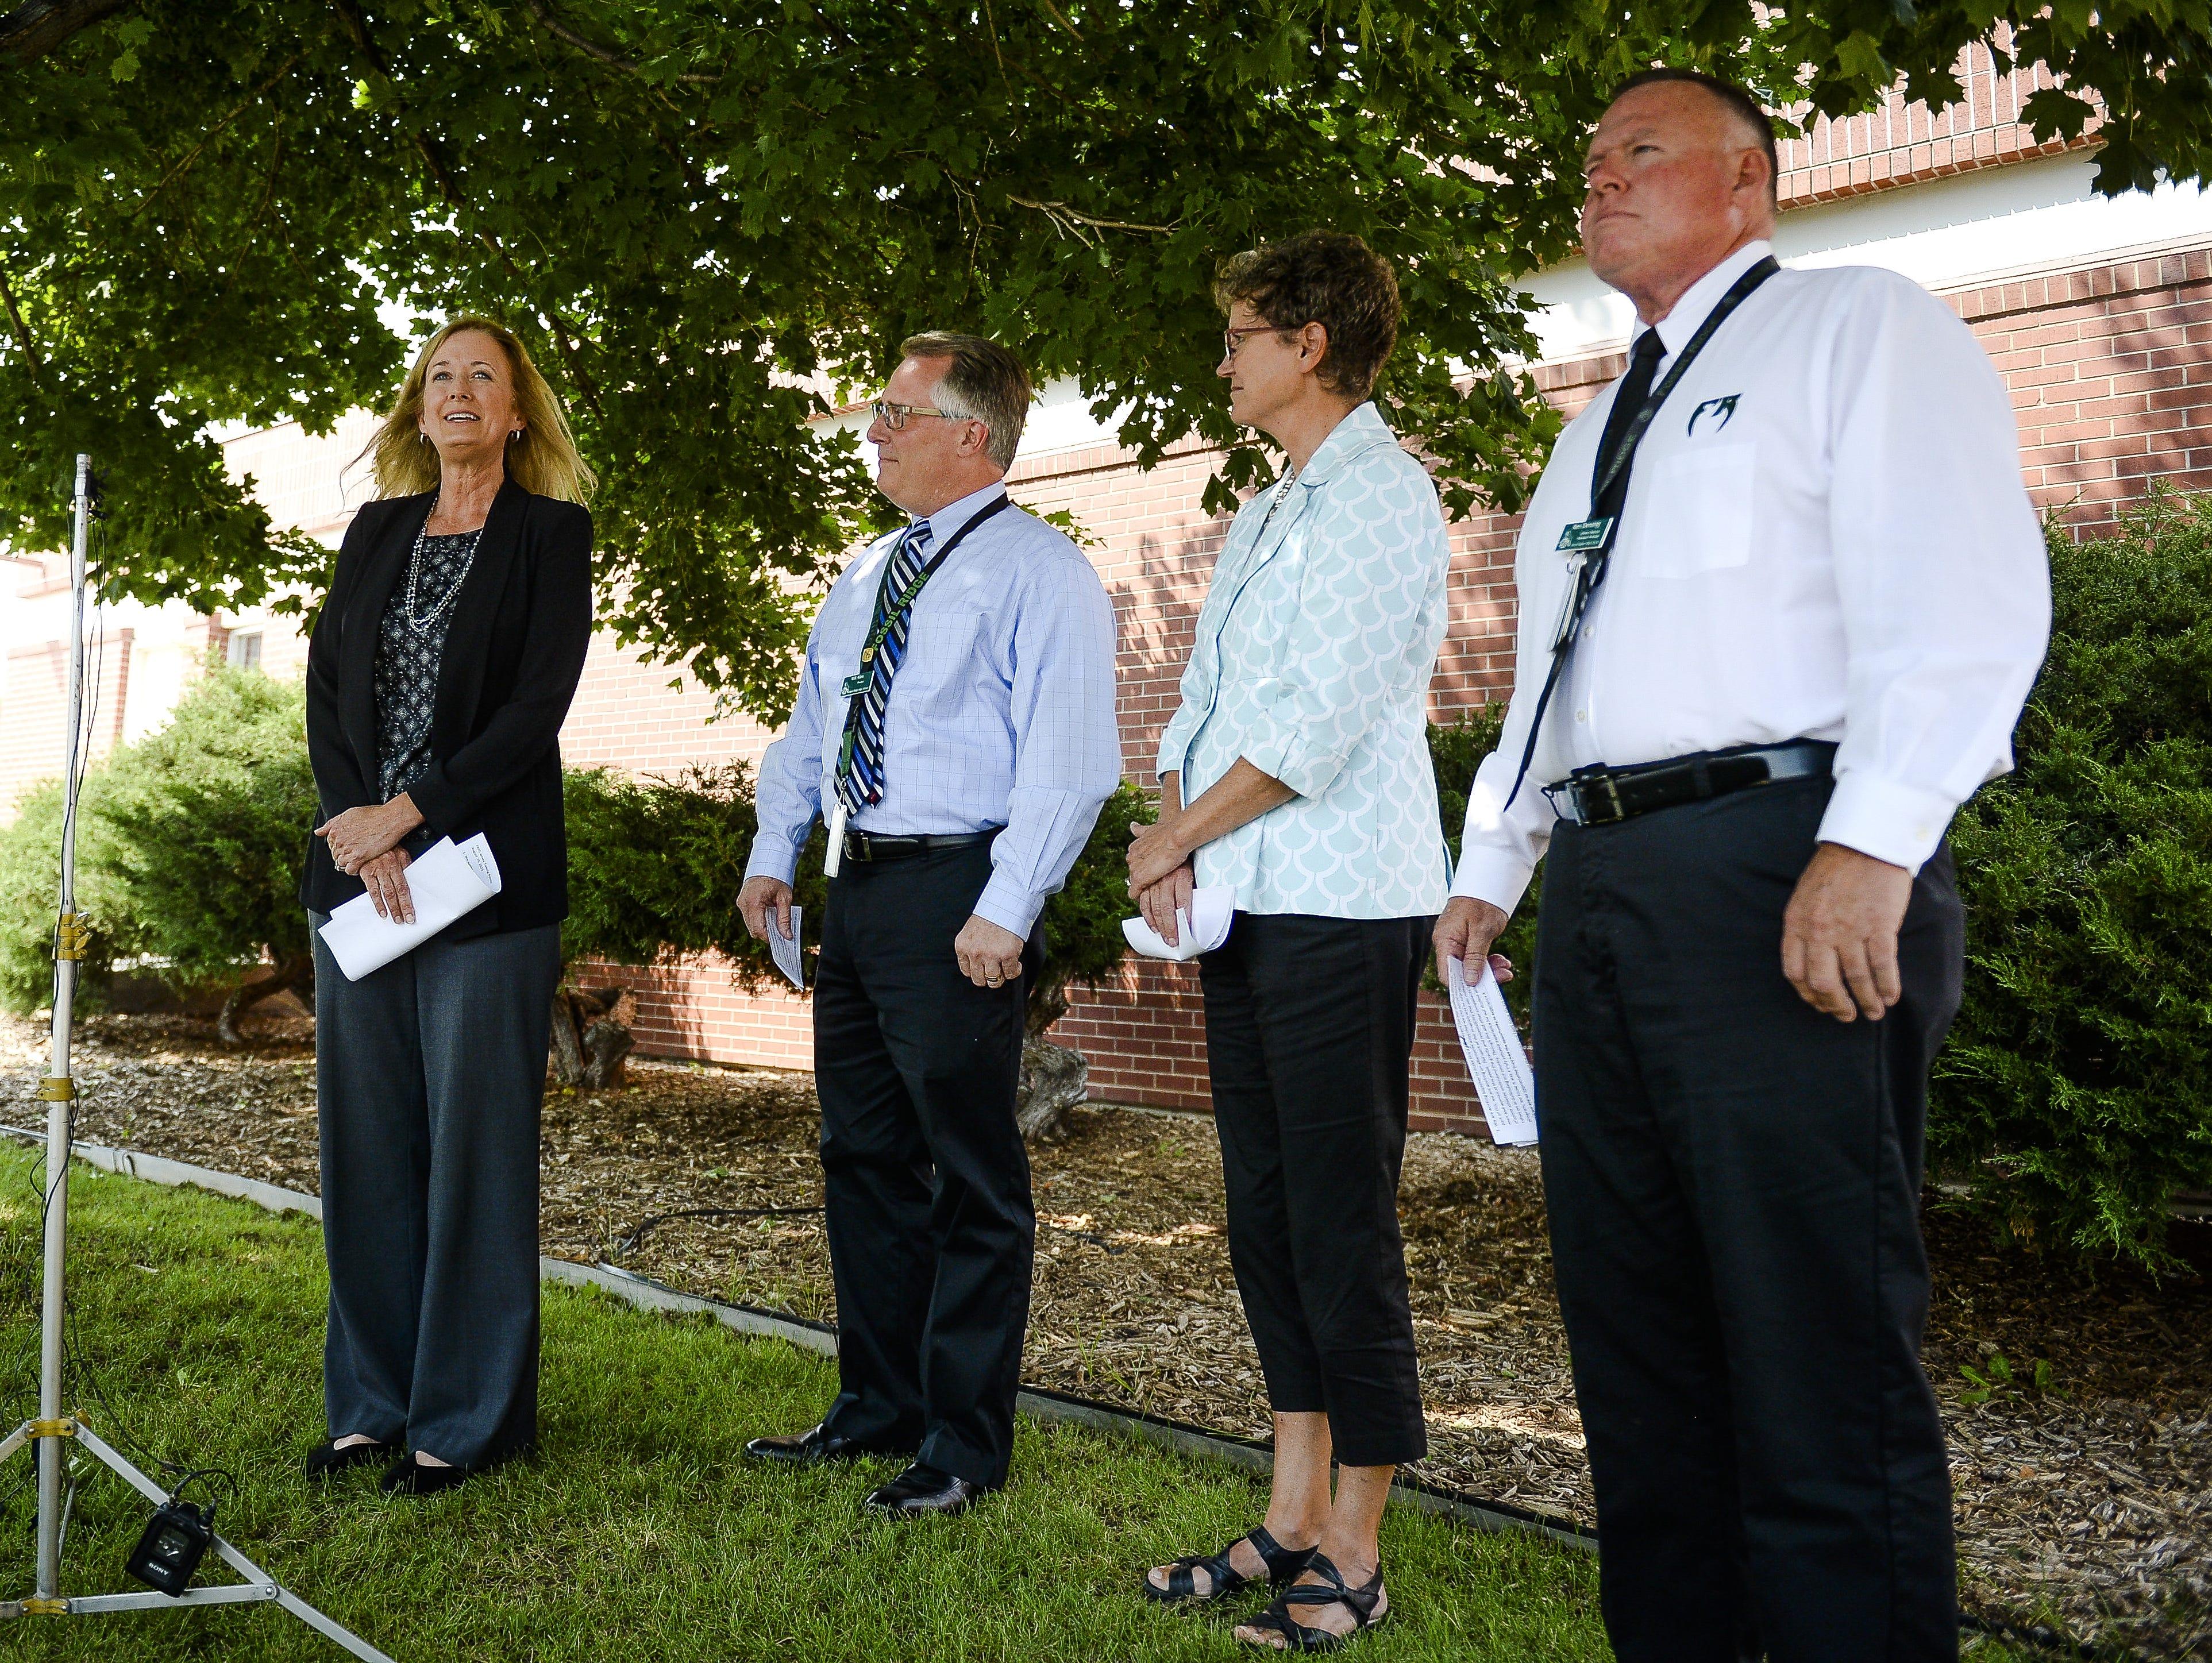 Fossil Ridge High School athletic director Ken Denning, far right, has resigned.